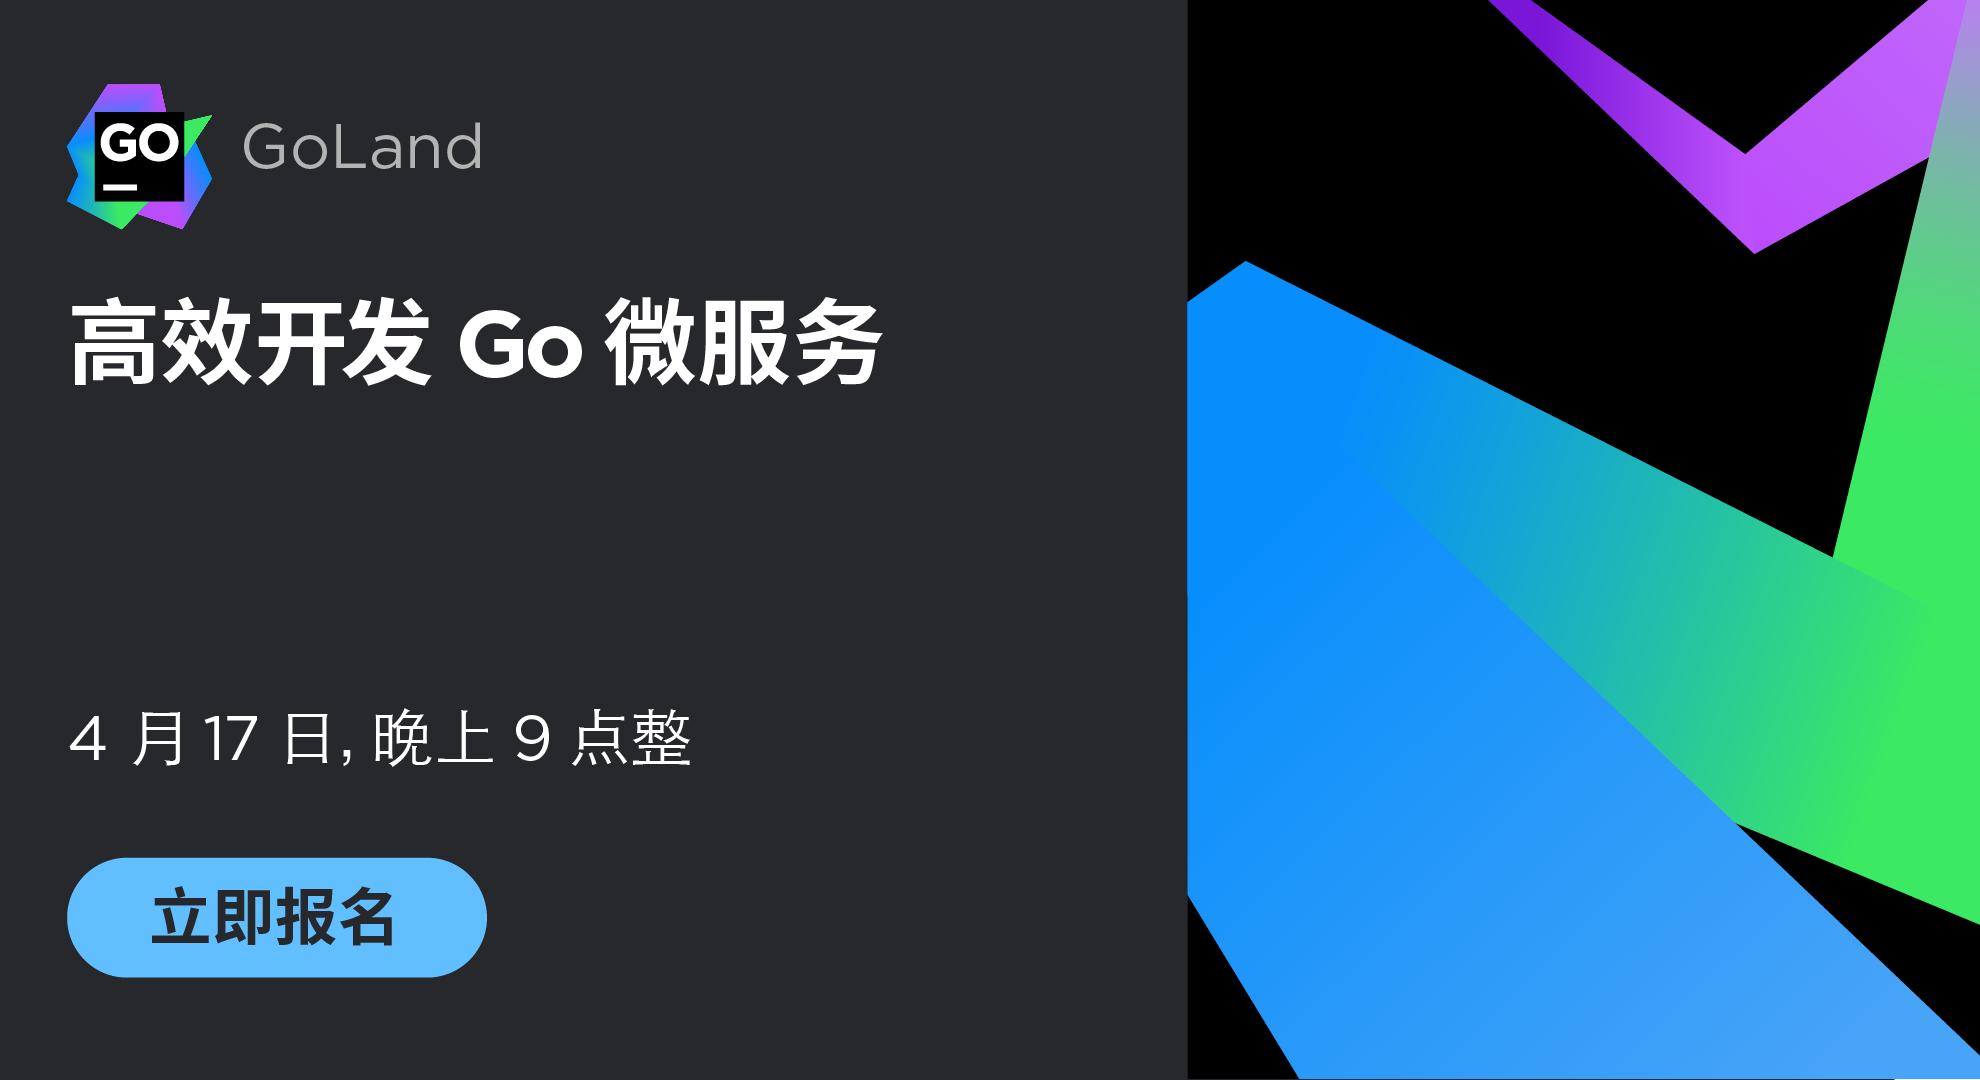 GoLand-Webinar